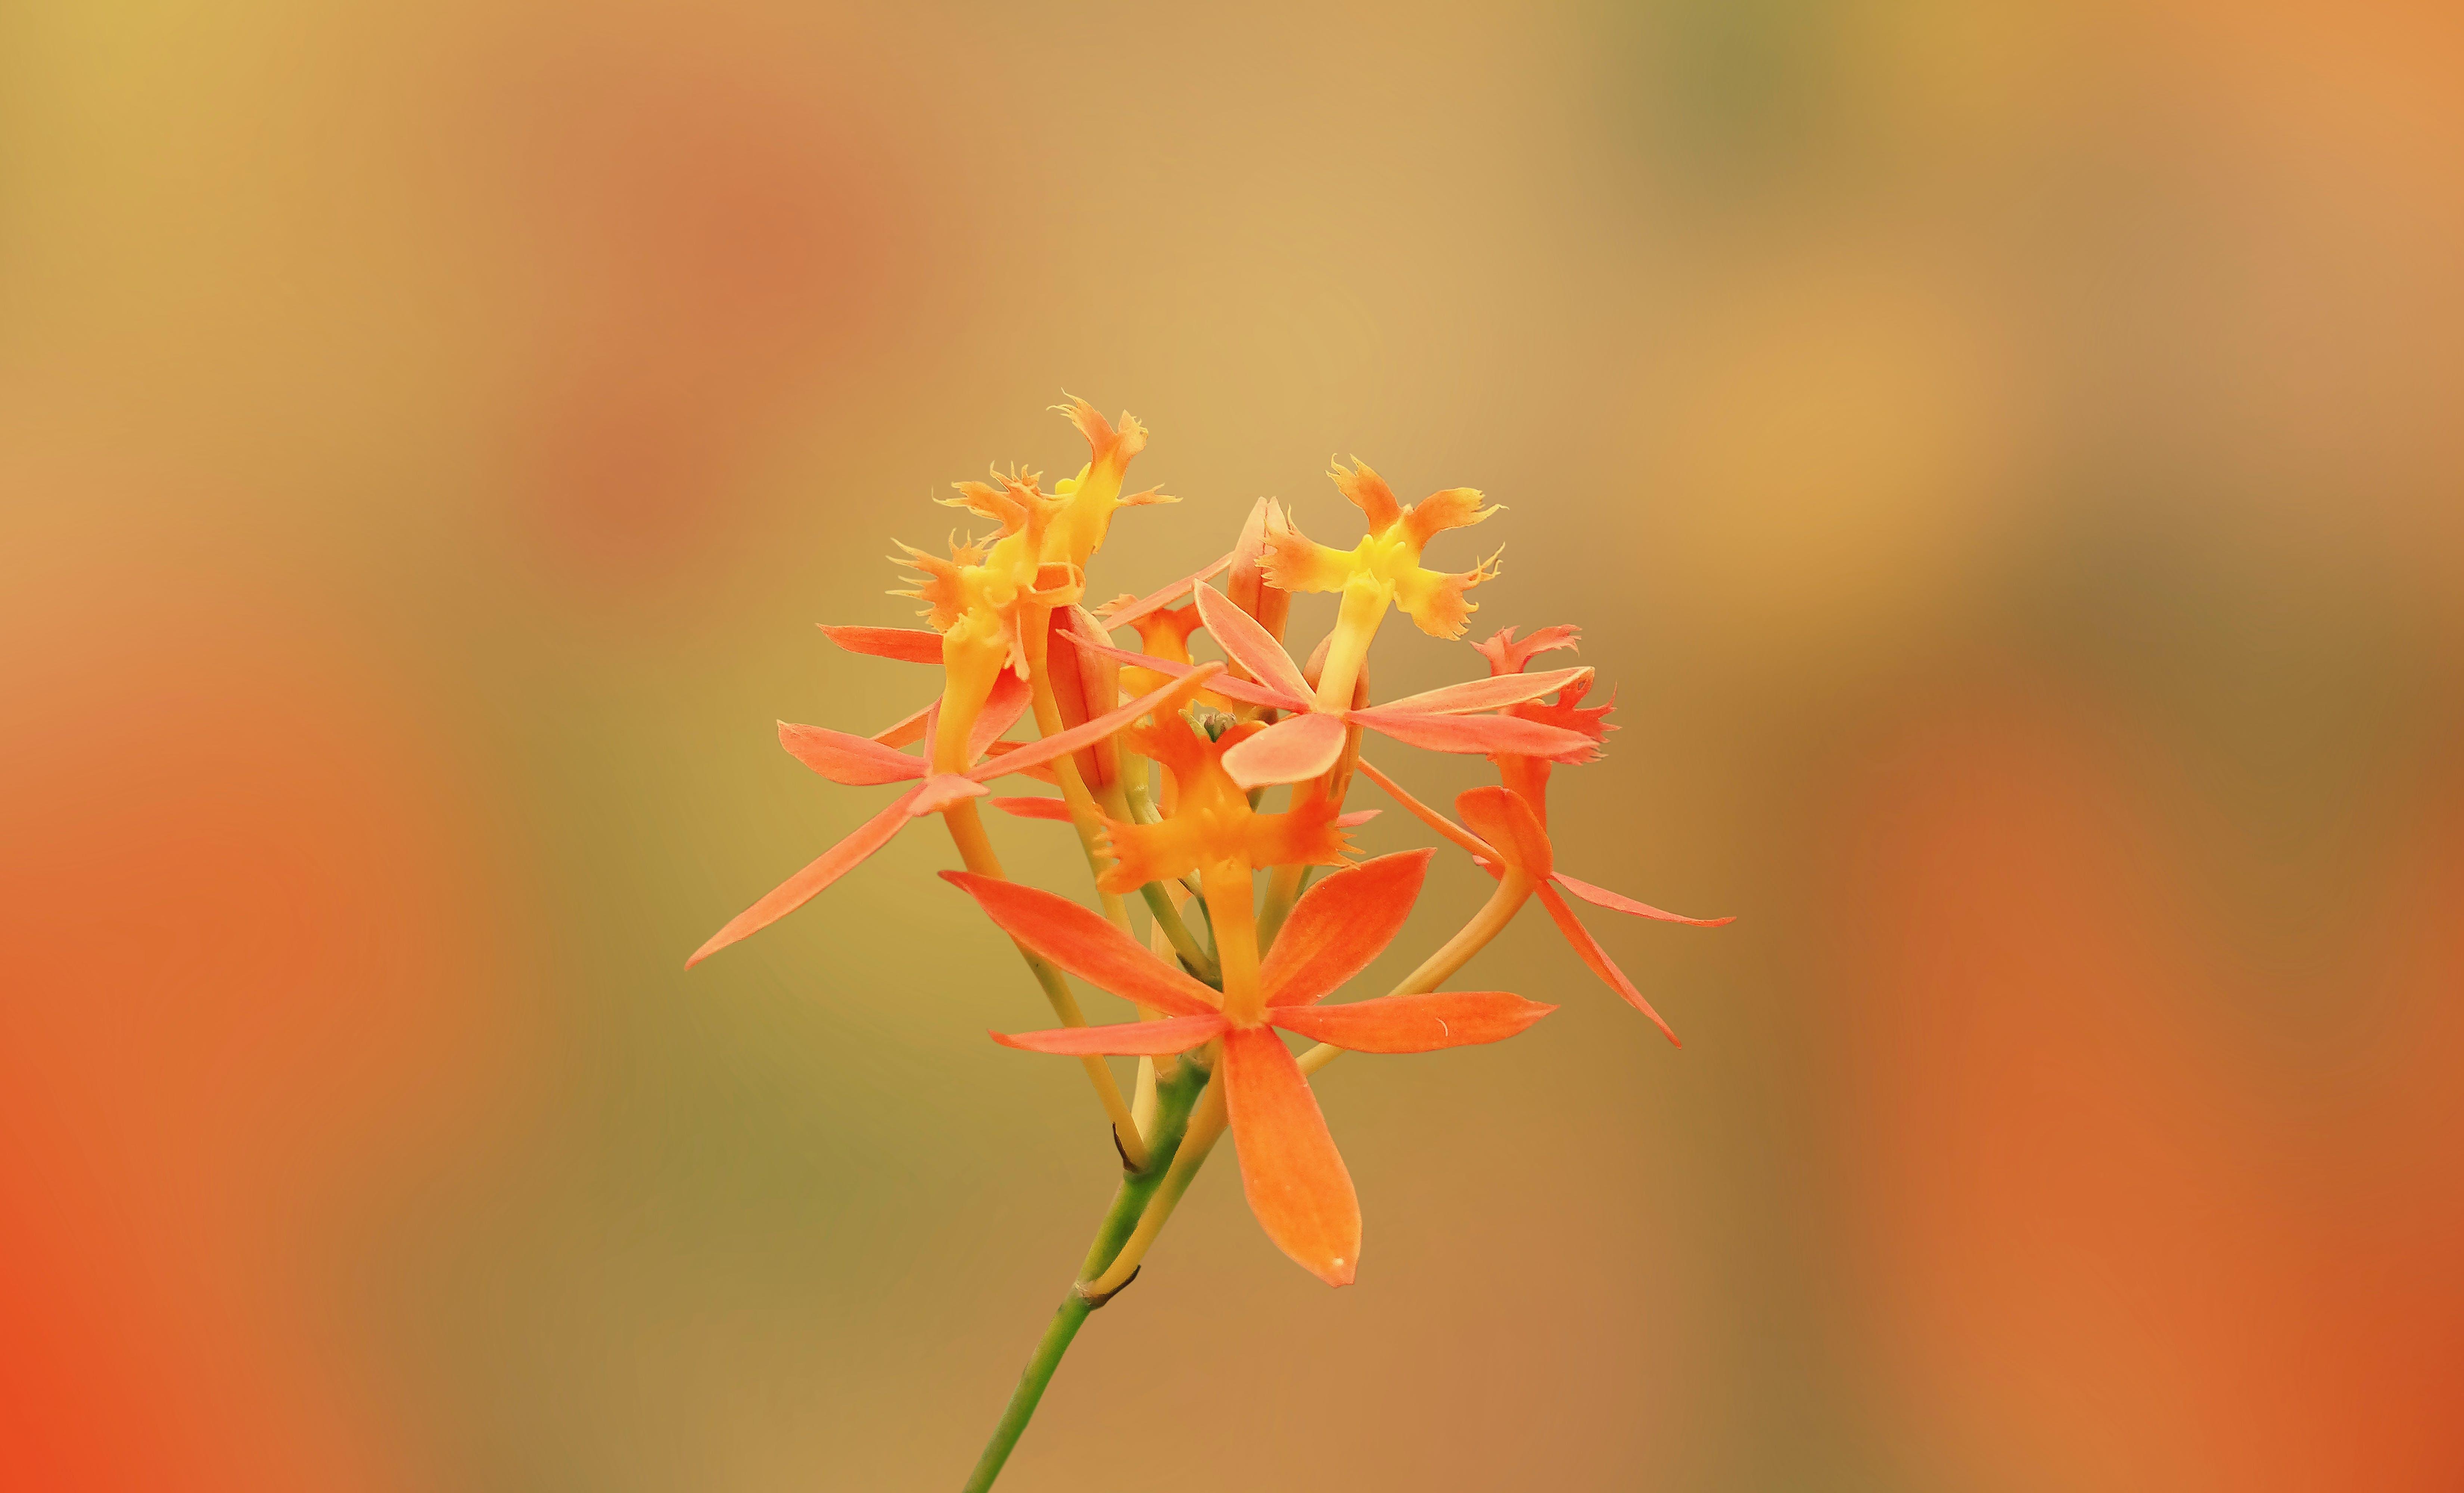 Free stock photo of green background, orange background, orange color, orange flower